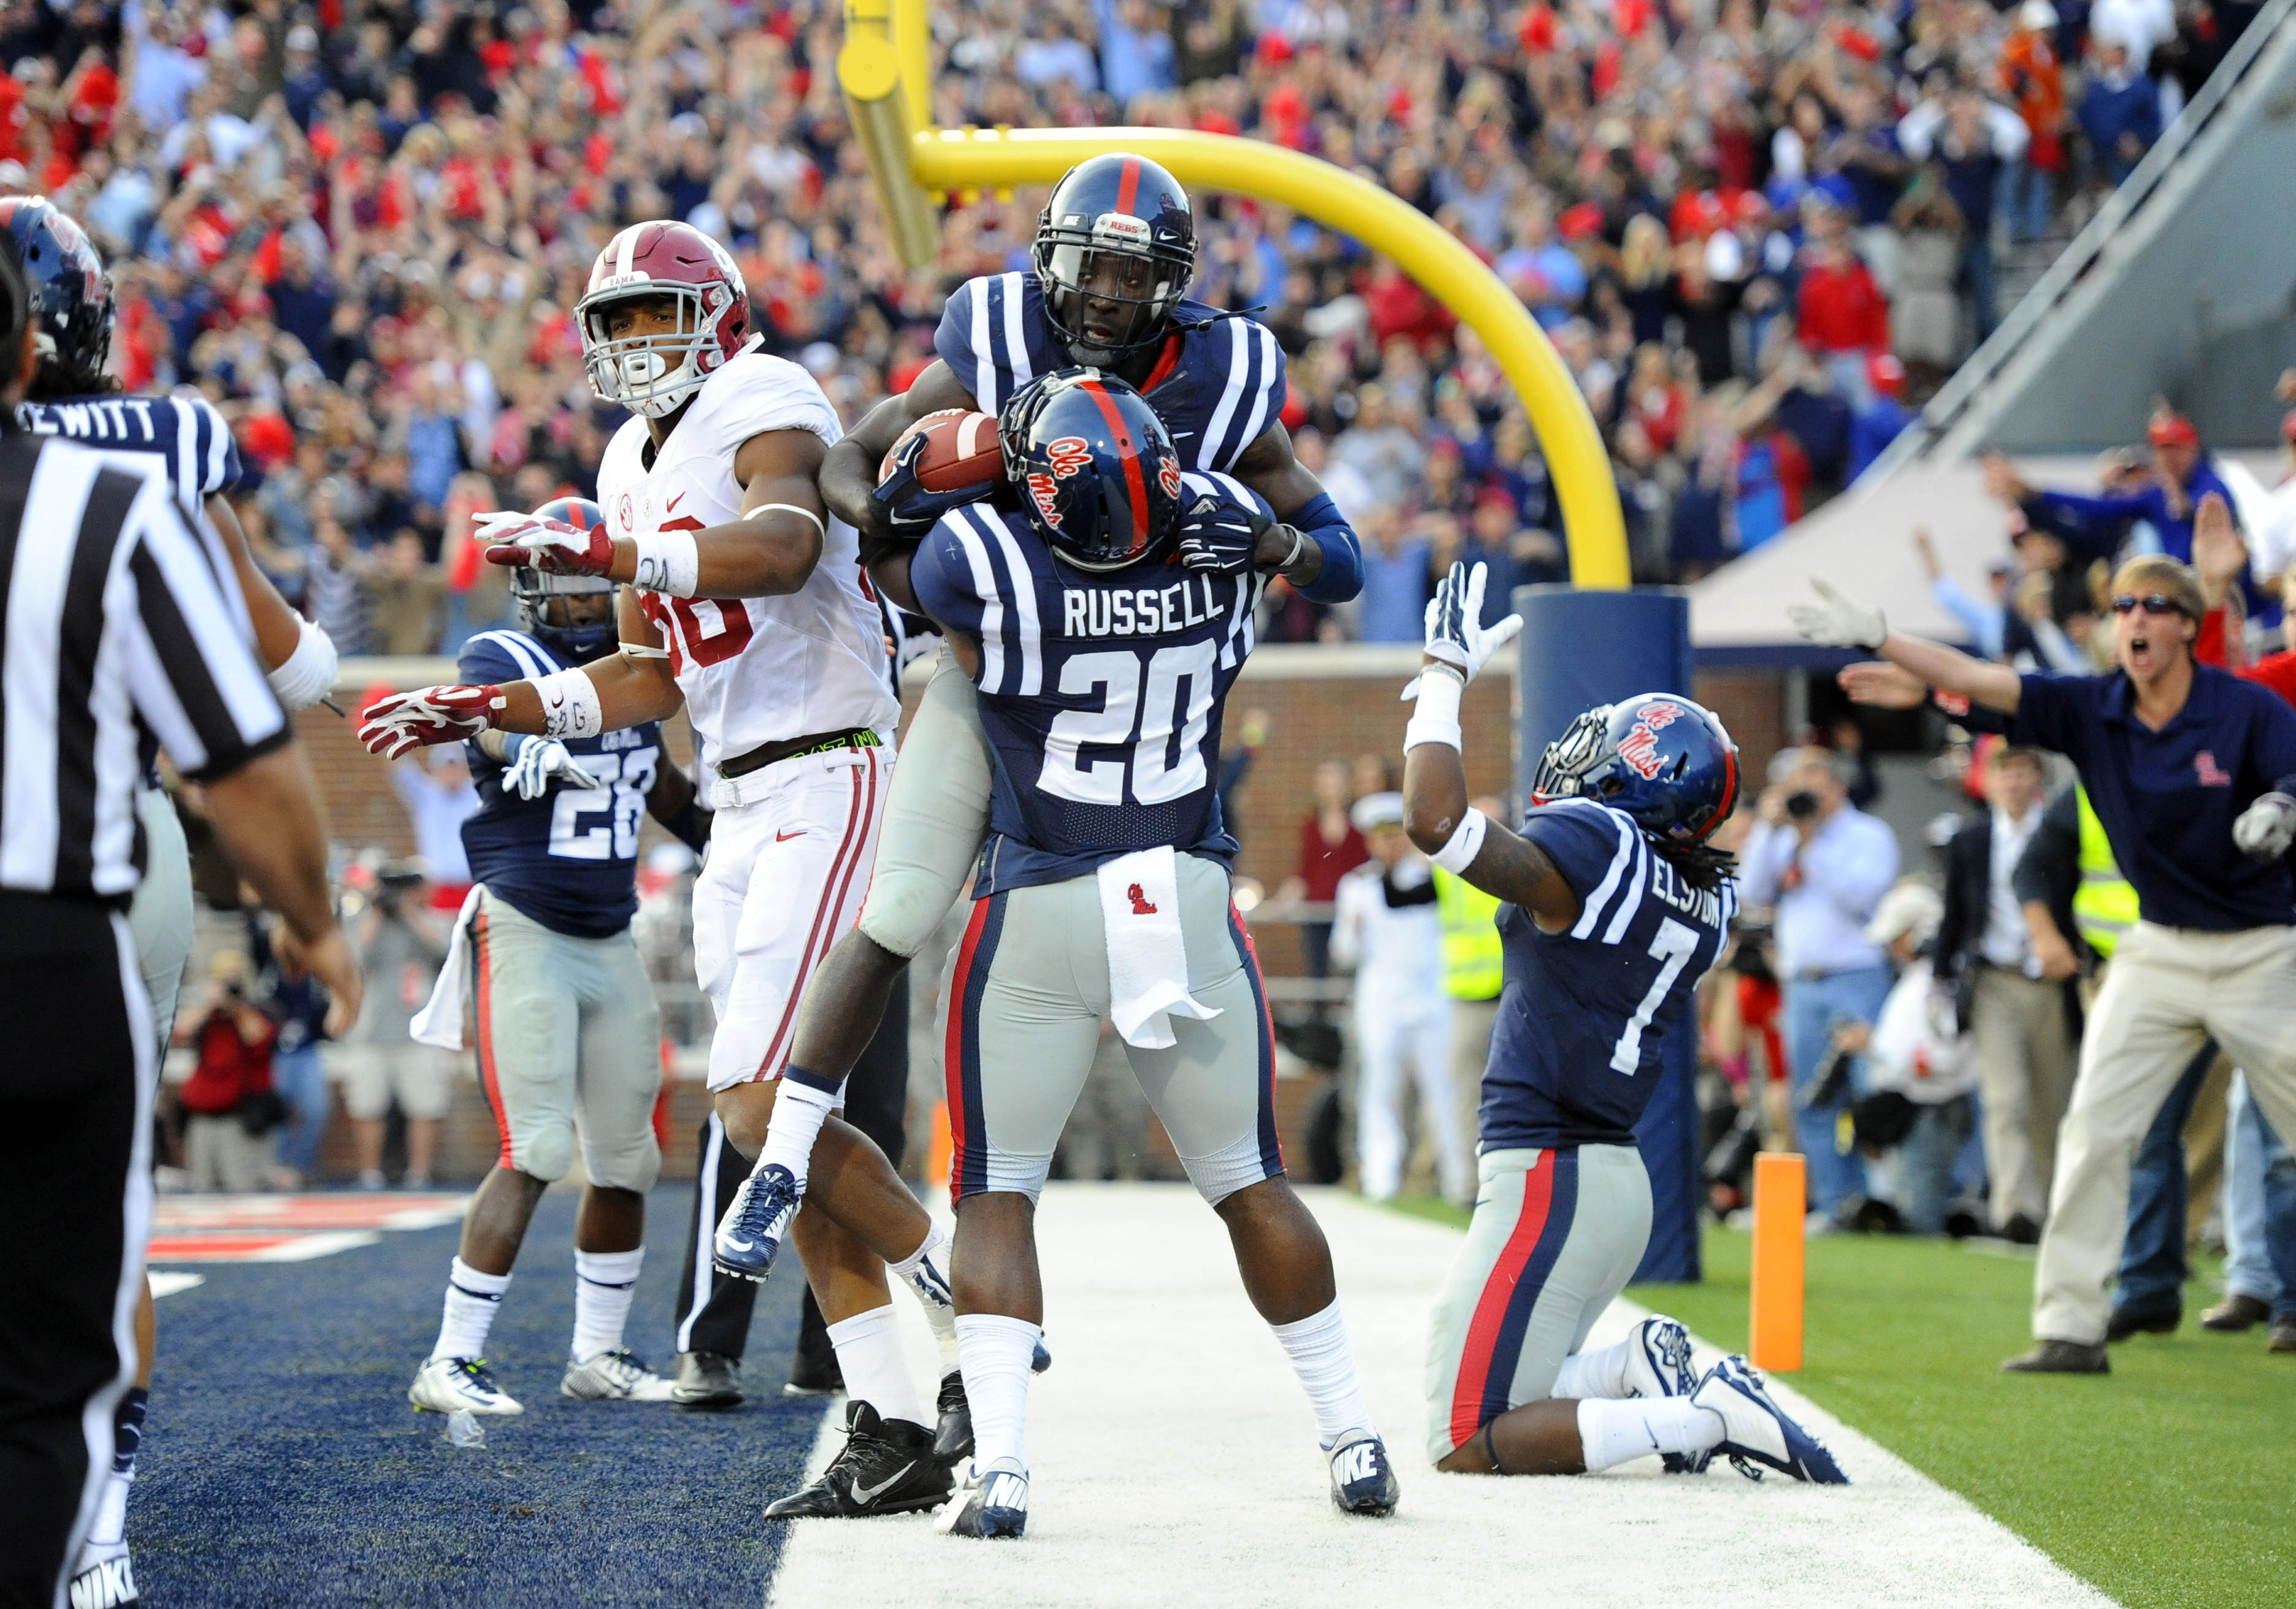 Mississippi upset Alabama last season in Oxford. (Christopher Hanewinckel, USA TODAY Sports)